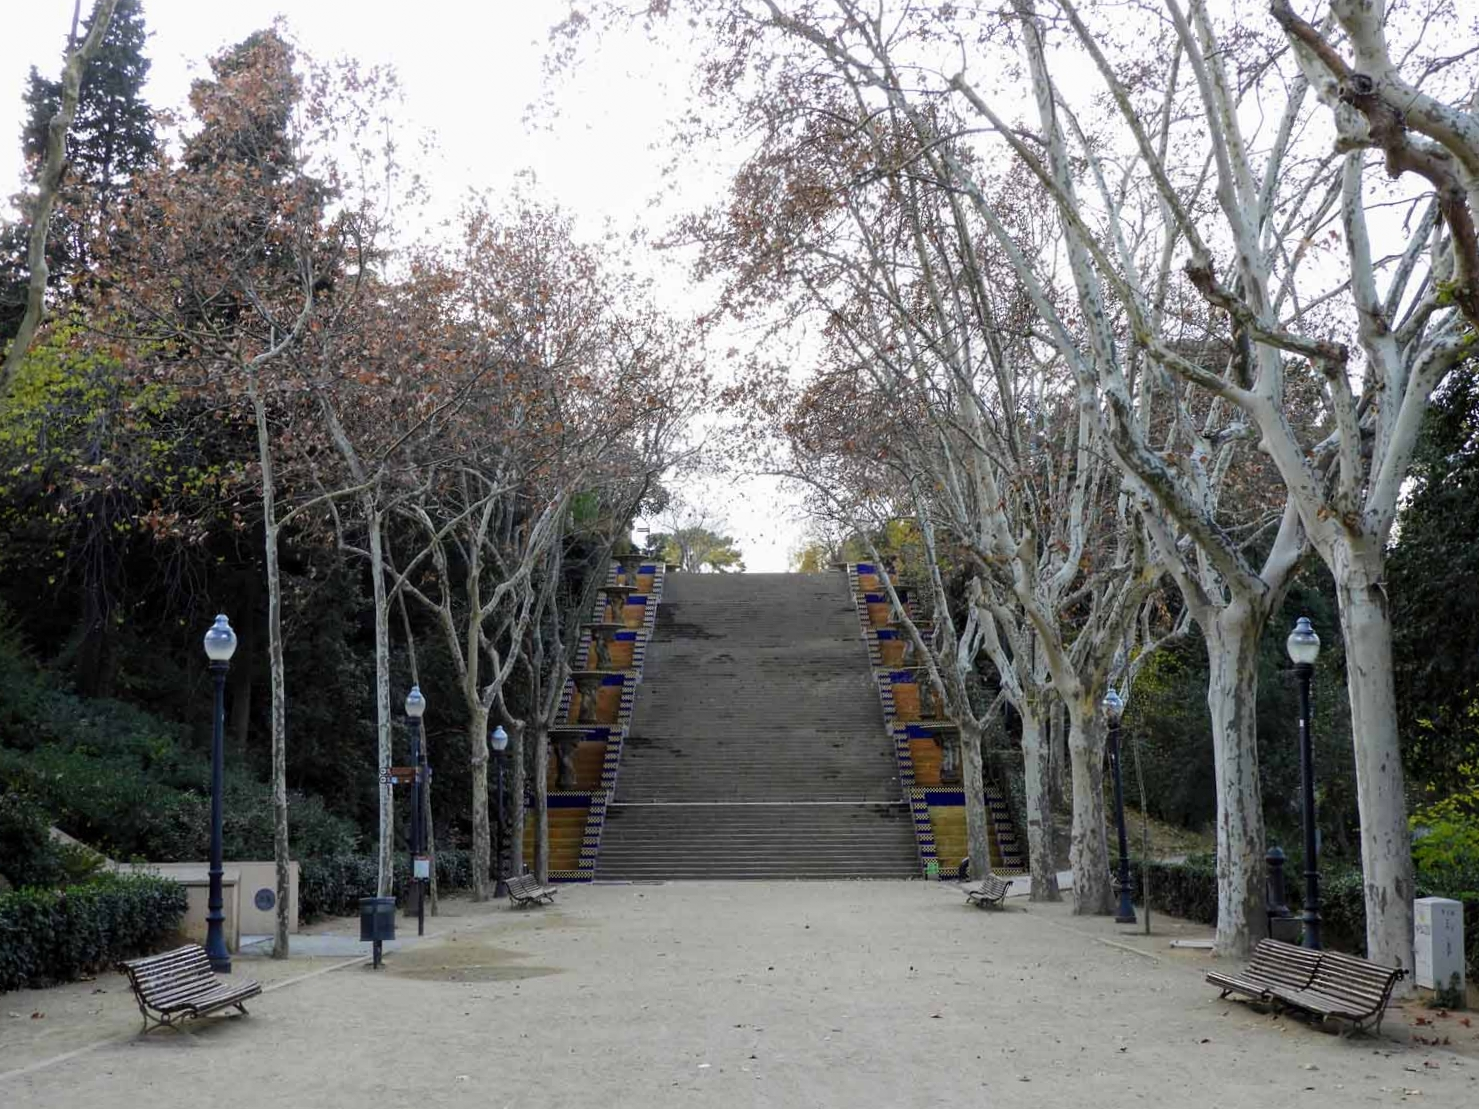 spain-barcelona-montjuic.jpg